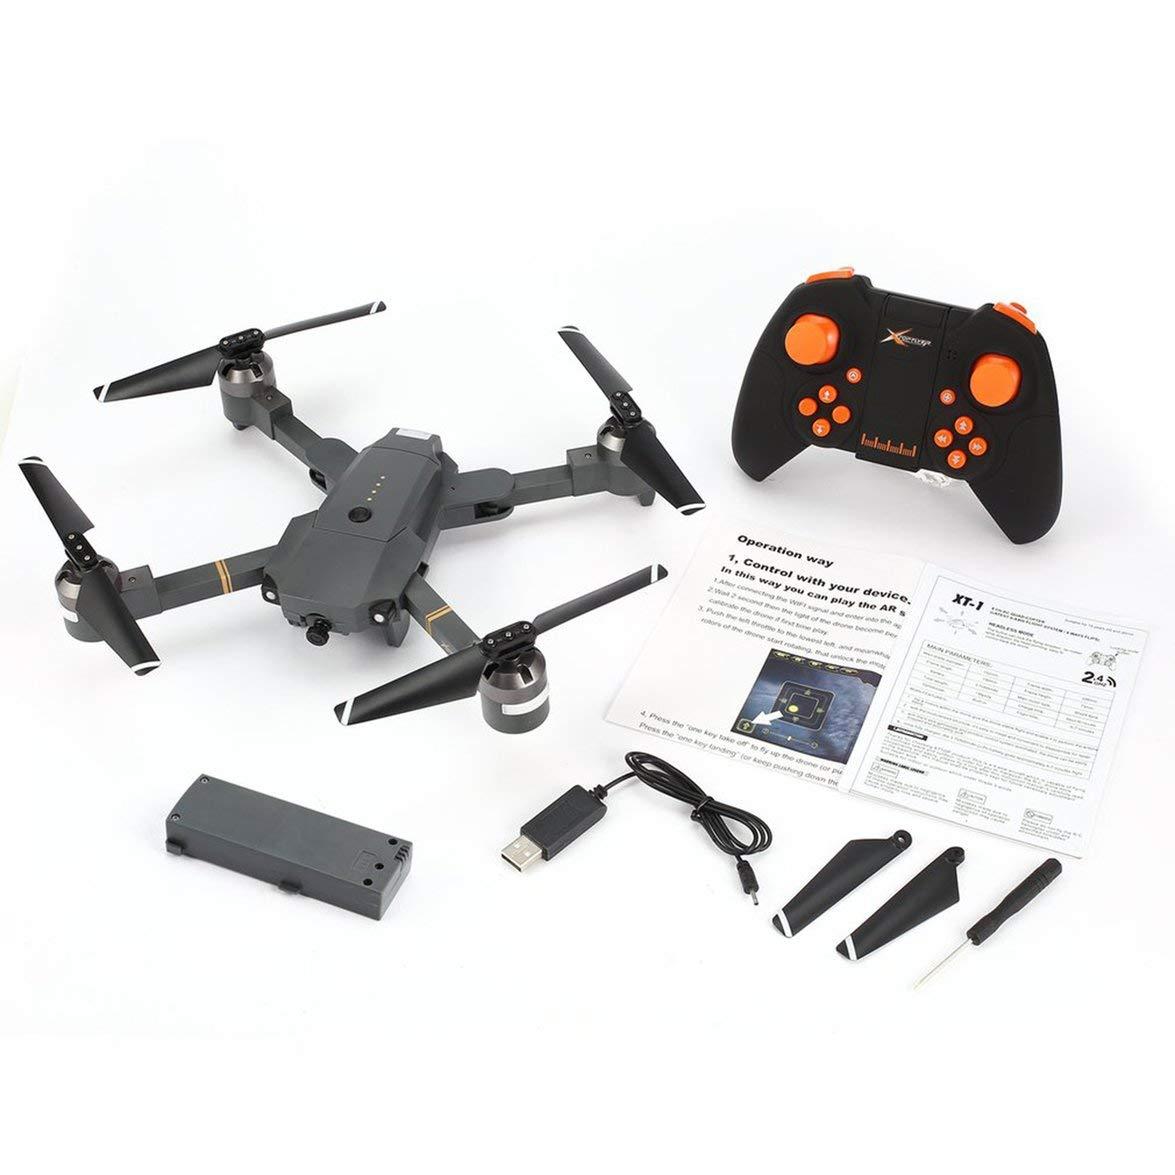 Kongqiabona Attop Attop Attop XT-1 2,4 GHz 6-Achsen-Gyro Faltbare Drohne Wi-Fi 2MP HD Kamera FPV RC Quadcopter mit Headless-Modus Höhe halten 3D-Flips 06f377